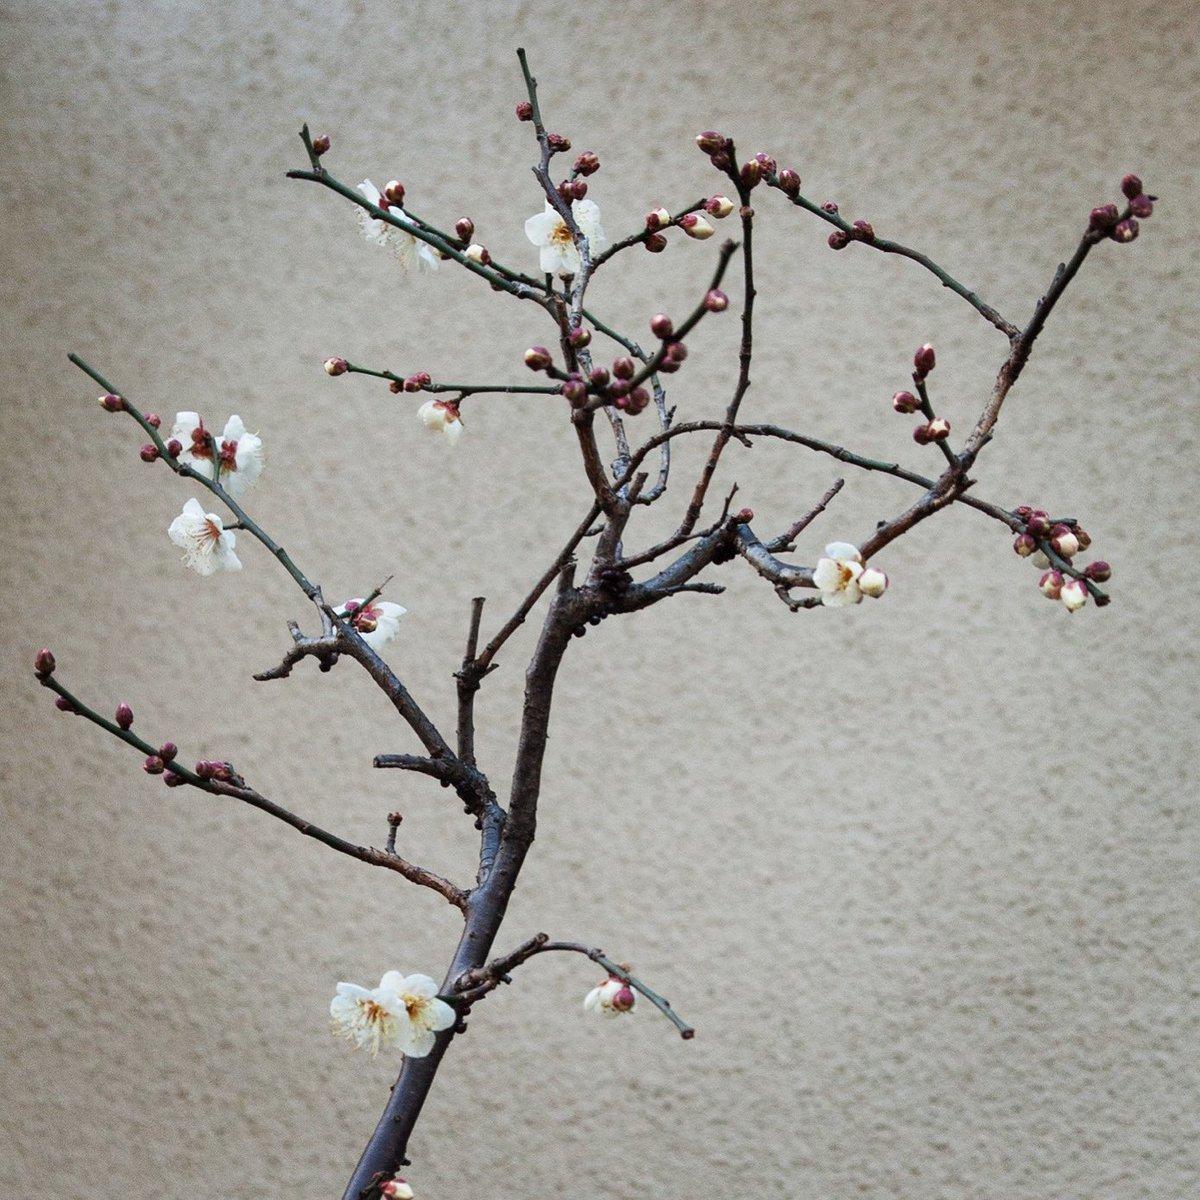 At the early spring  #snapshot #flowers #写真好きな人と繋がりたい #写真撮ってる人と繋がりたい #キリトリセカイ #ファインダー越しの私の世界 #半径500mのワンダーランド #東京カメラ部 #東京写真部 #pashadelicpic.twitter.com/rNKiCb8ZCD